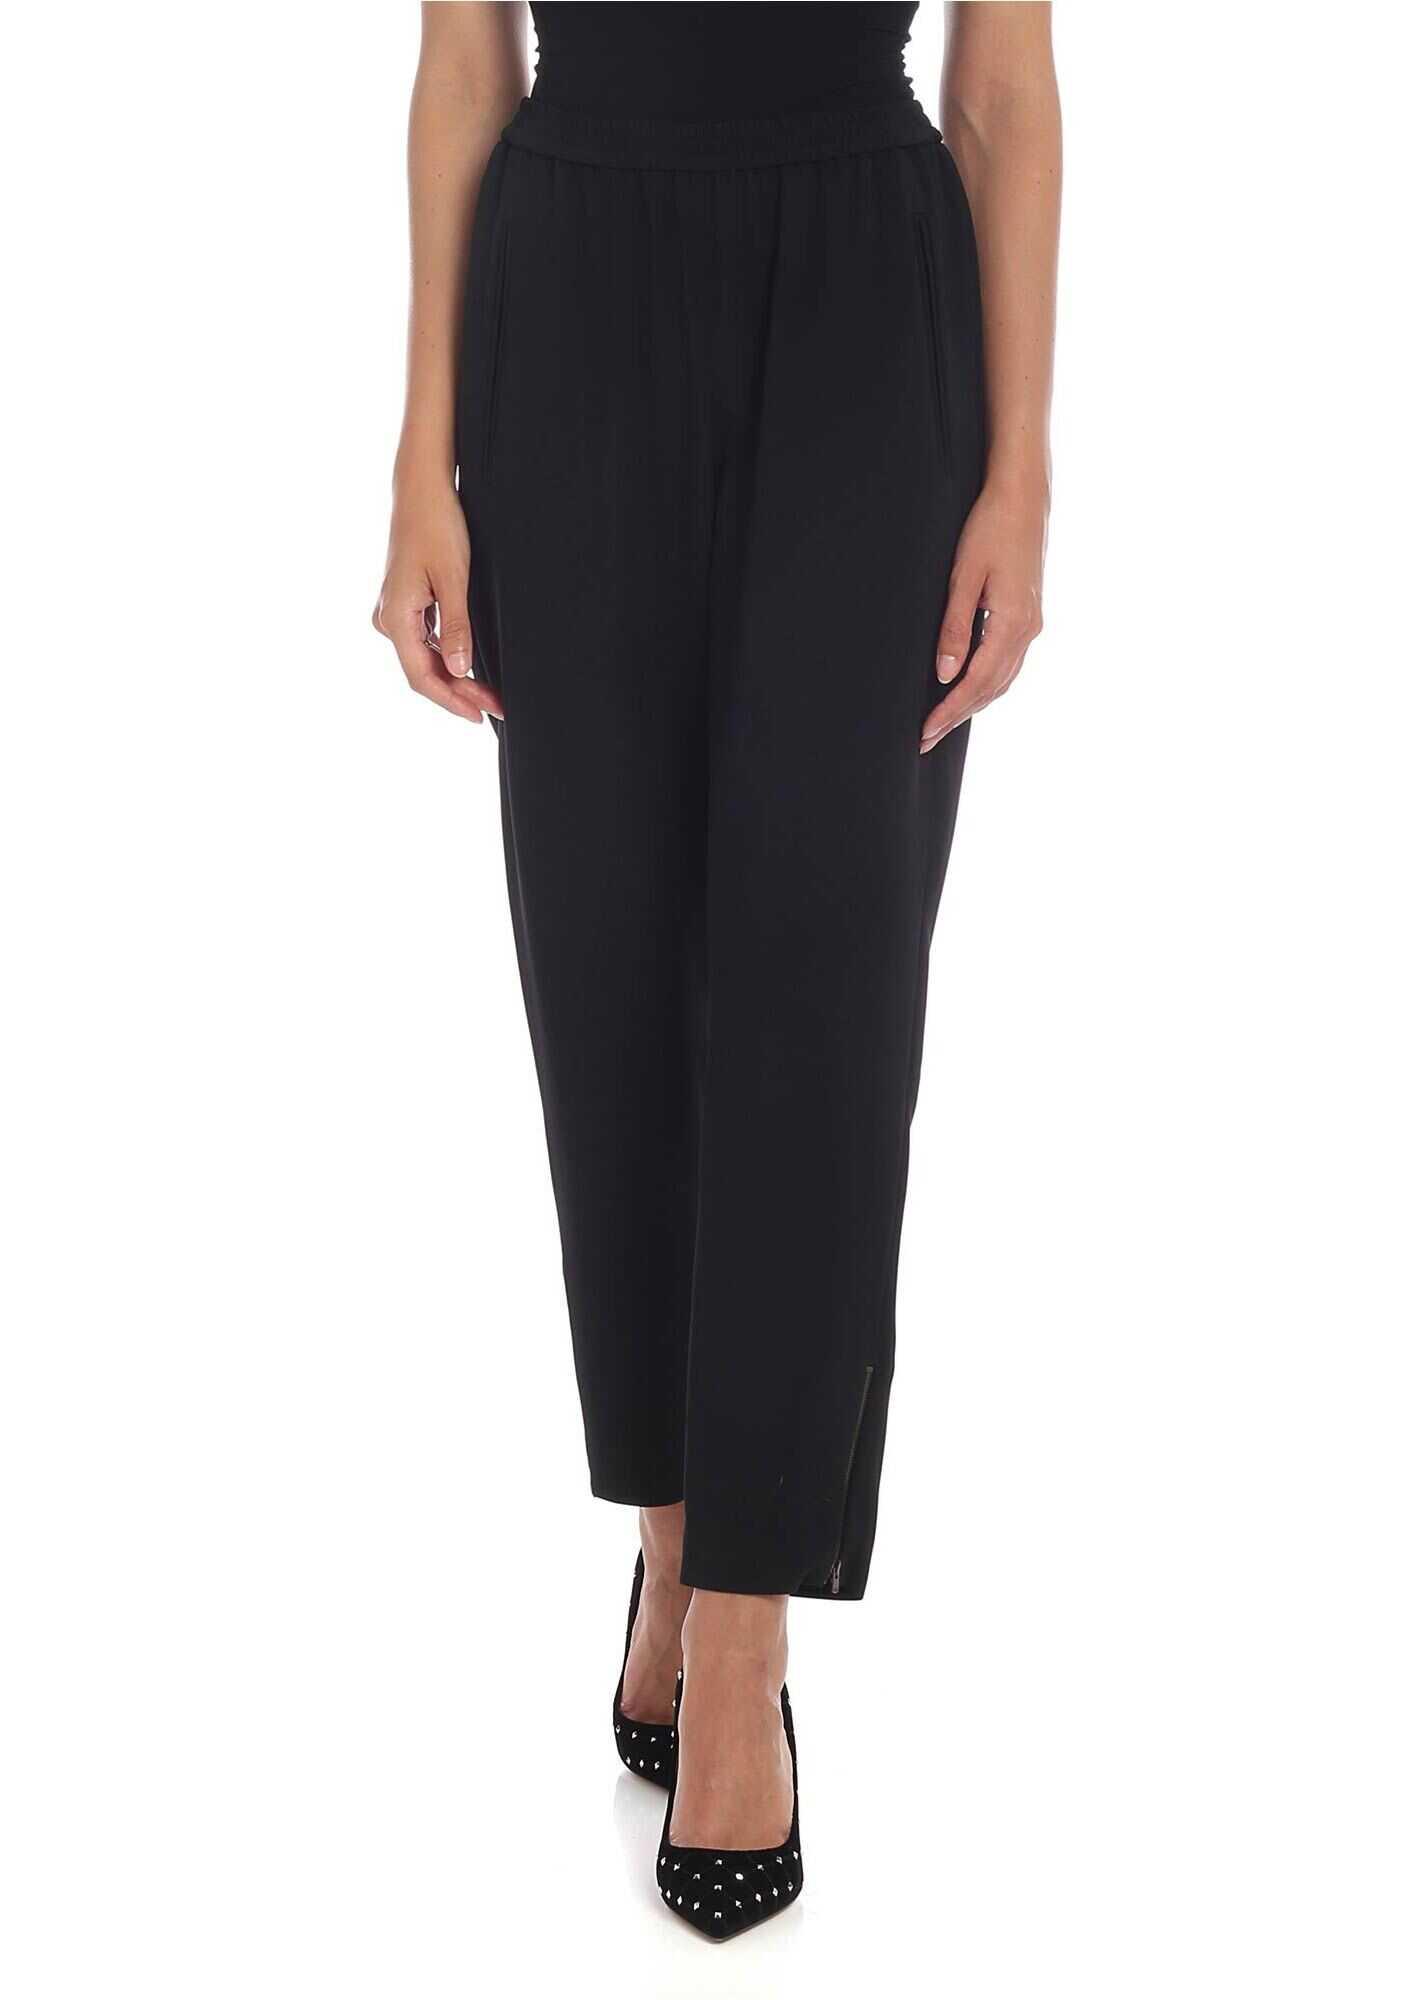 adidas by Stella McCartney Black Tamara Trousers Black